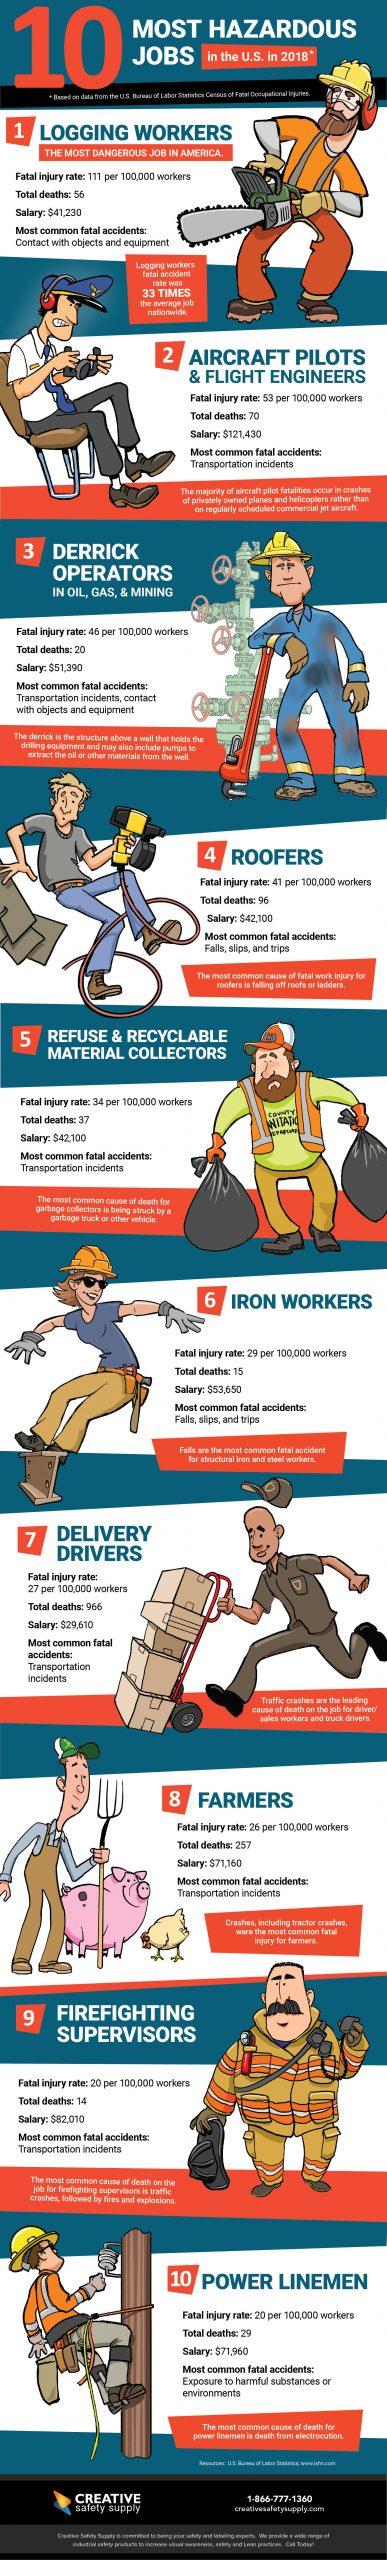 Infographic depicting the ten most dangerous jobs in the U.S.